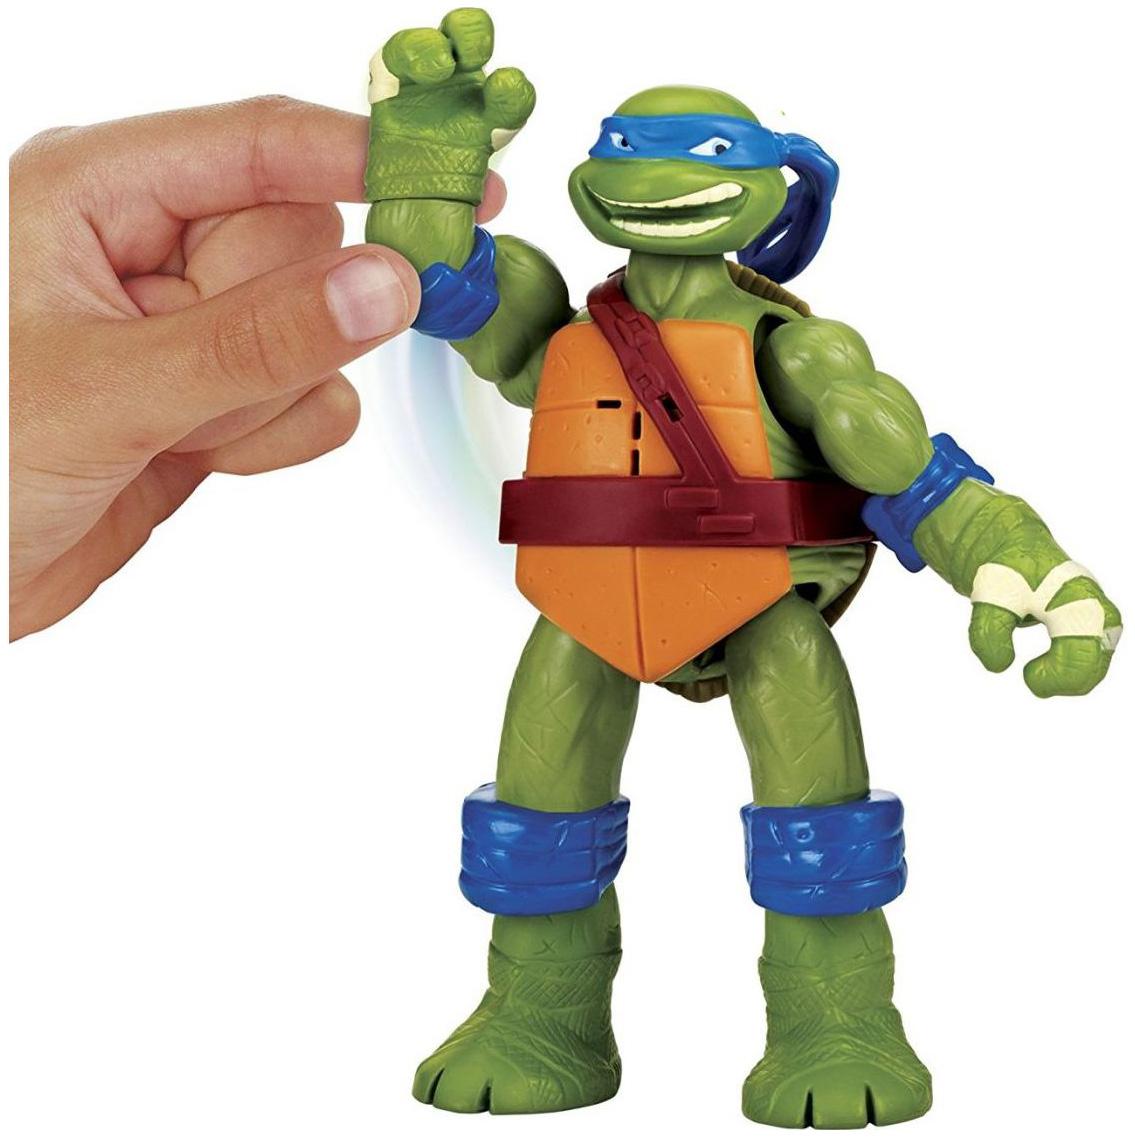 Купить Фигурка Playmates Toys черепашки-ниндзя, 15 см, Лео, клич ниндзя,